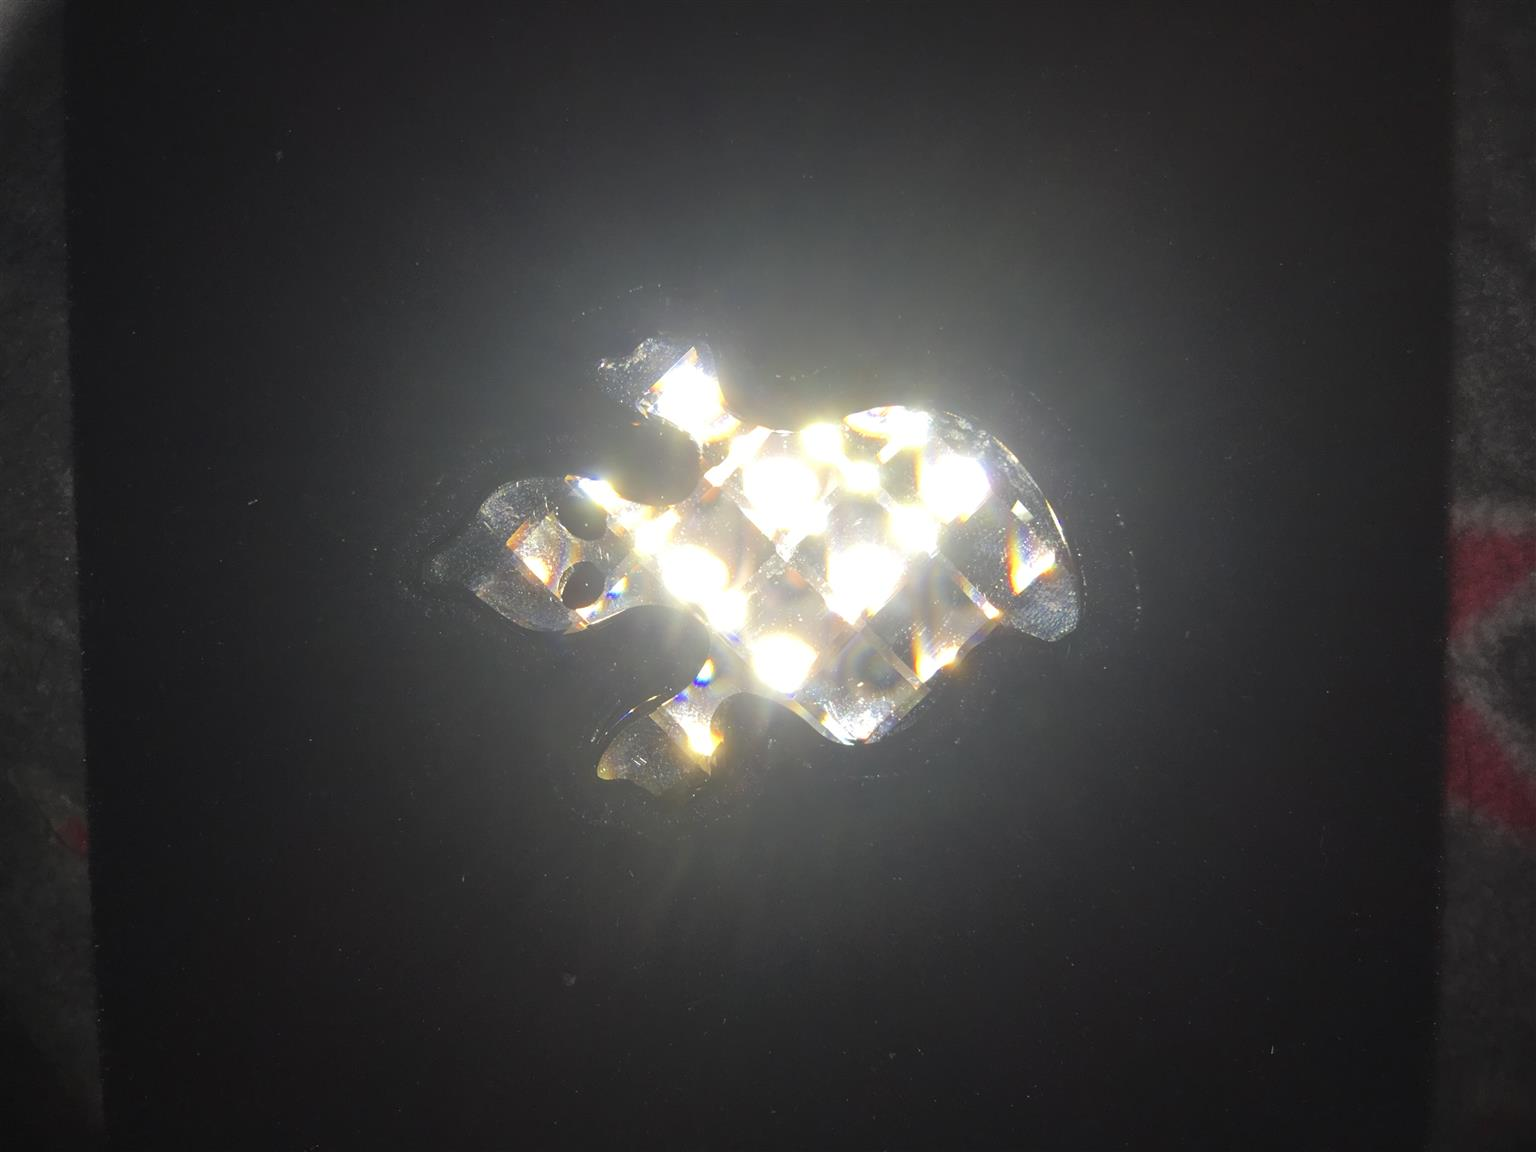 Swarovski Crystal Ornaments